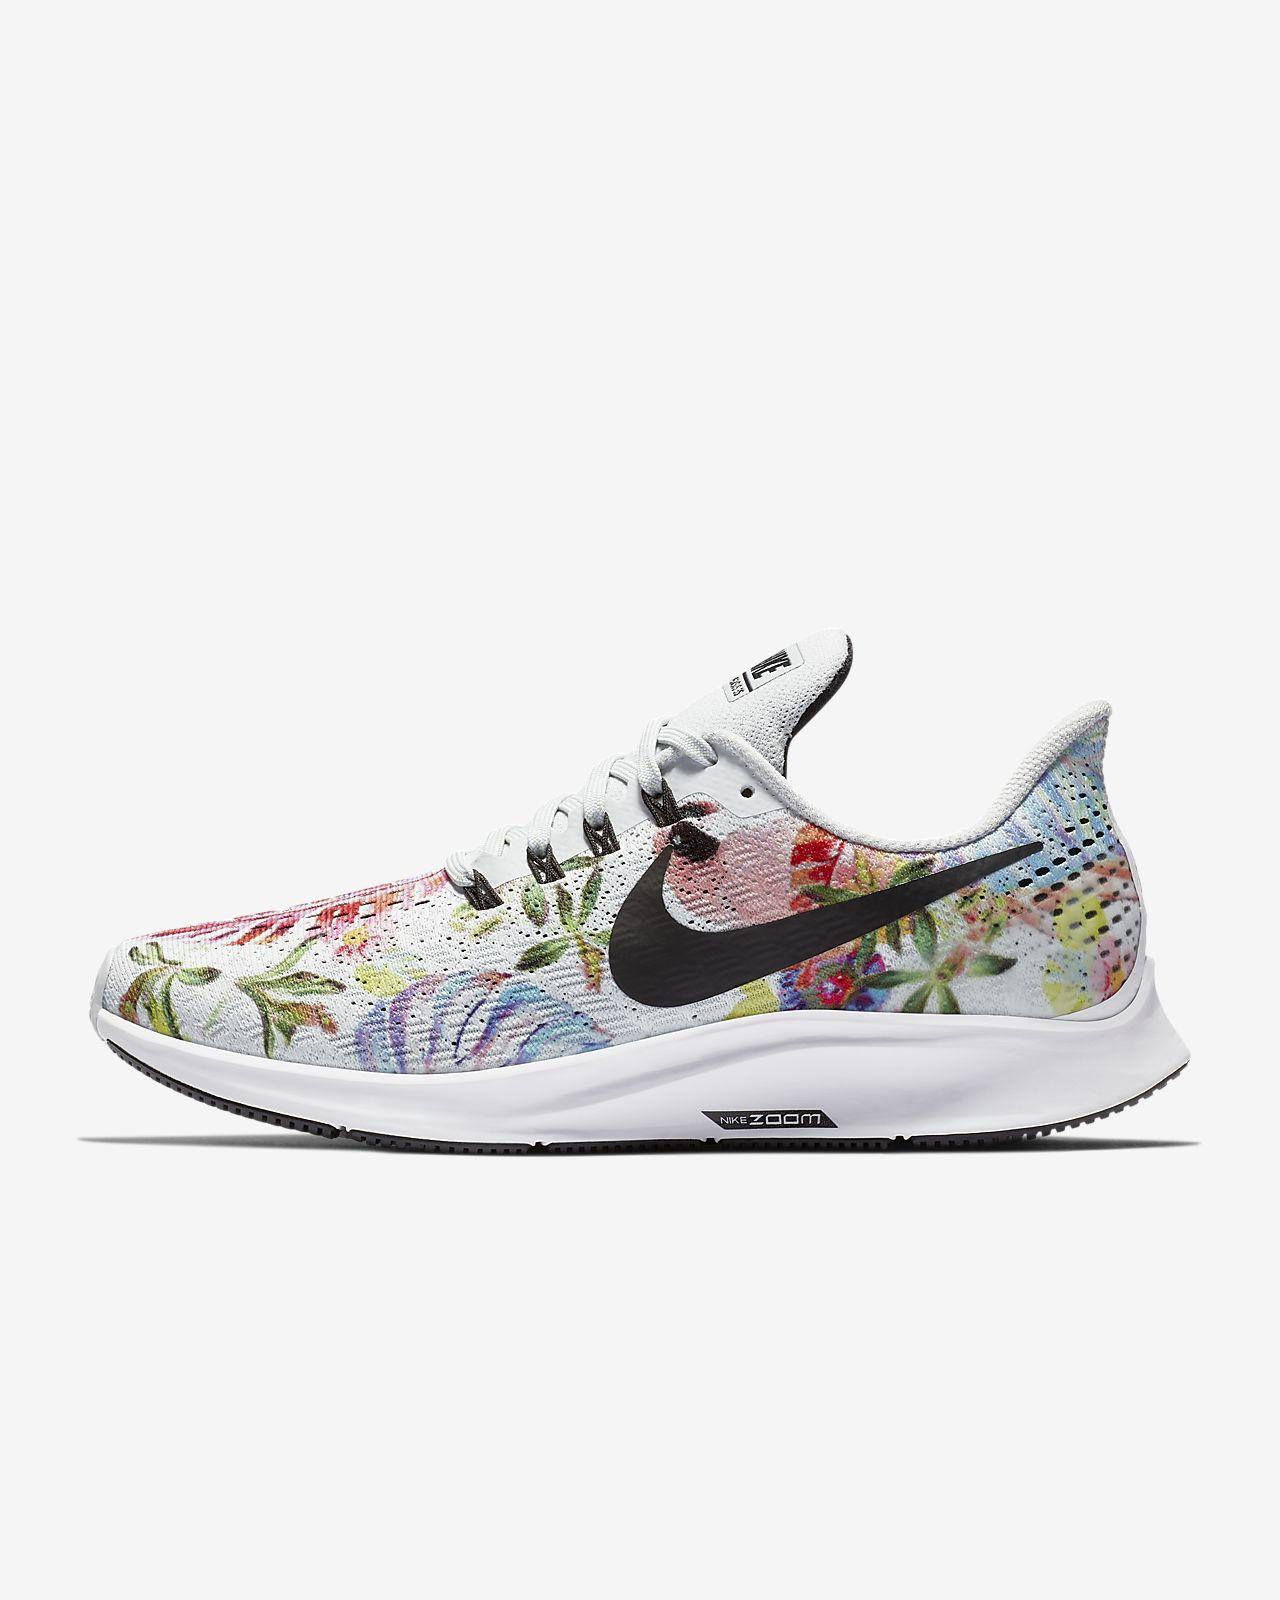 los angeles d836a 0c533 ... Nike Air Zoom Pegasus 35 GPX RS 女子跑步鞋